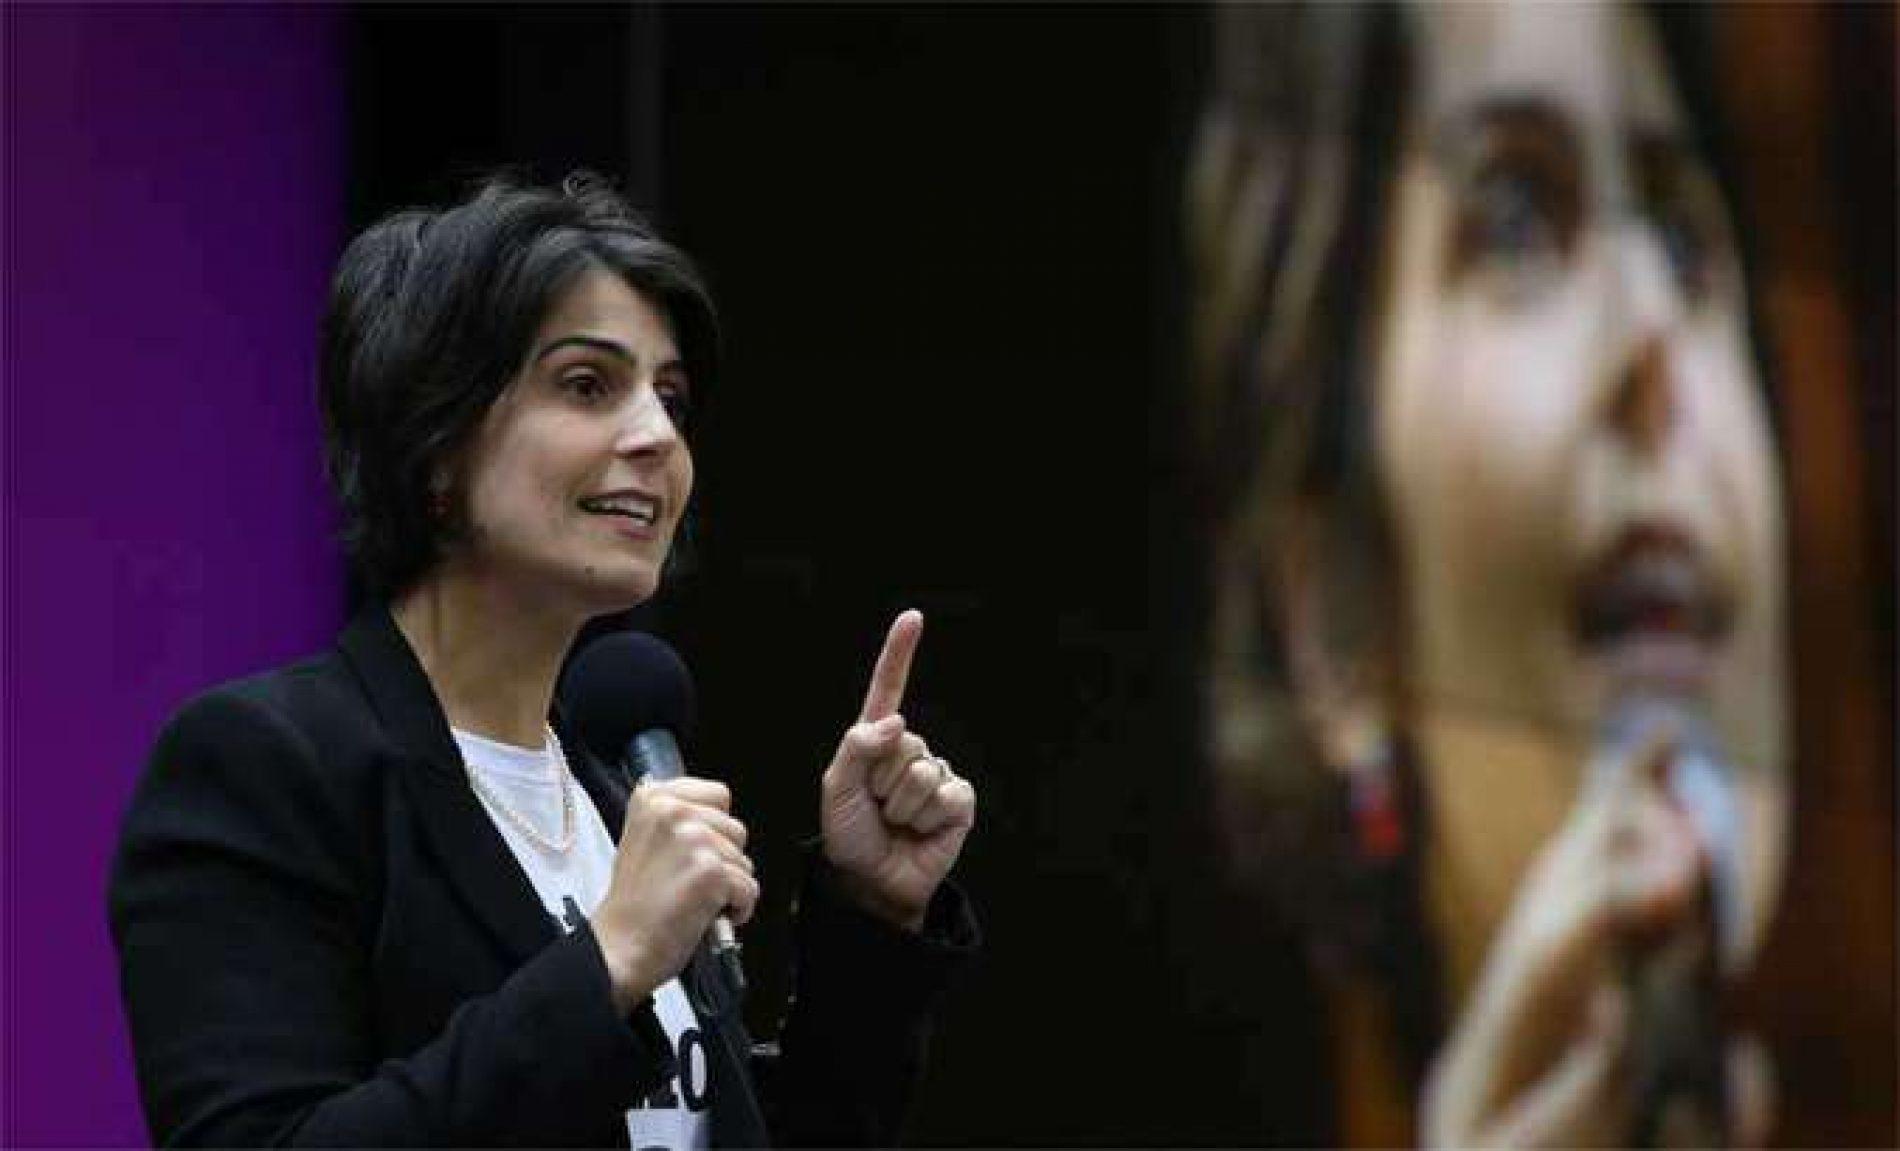 Ministro do TSE manda Facebook derrubar 33 fake news sobre Manuela do ar